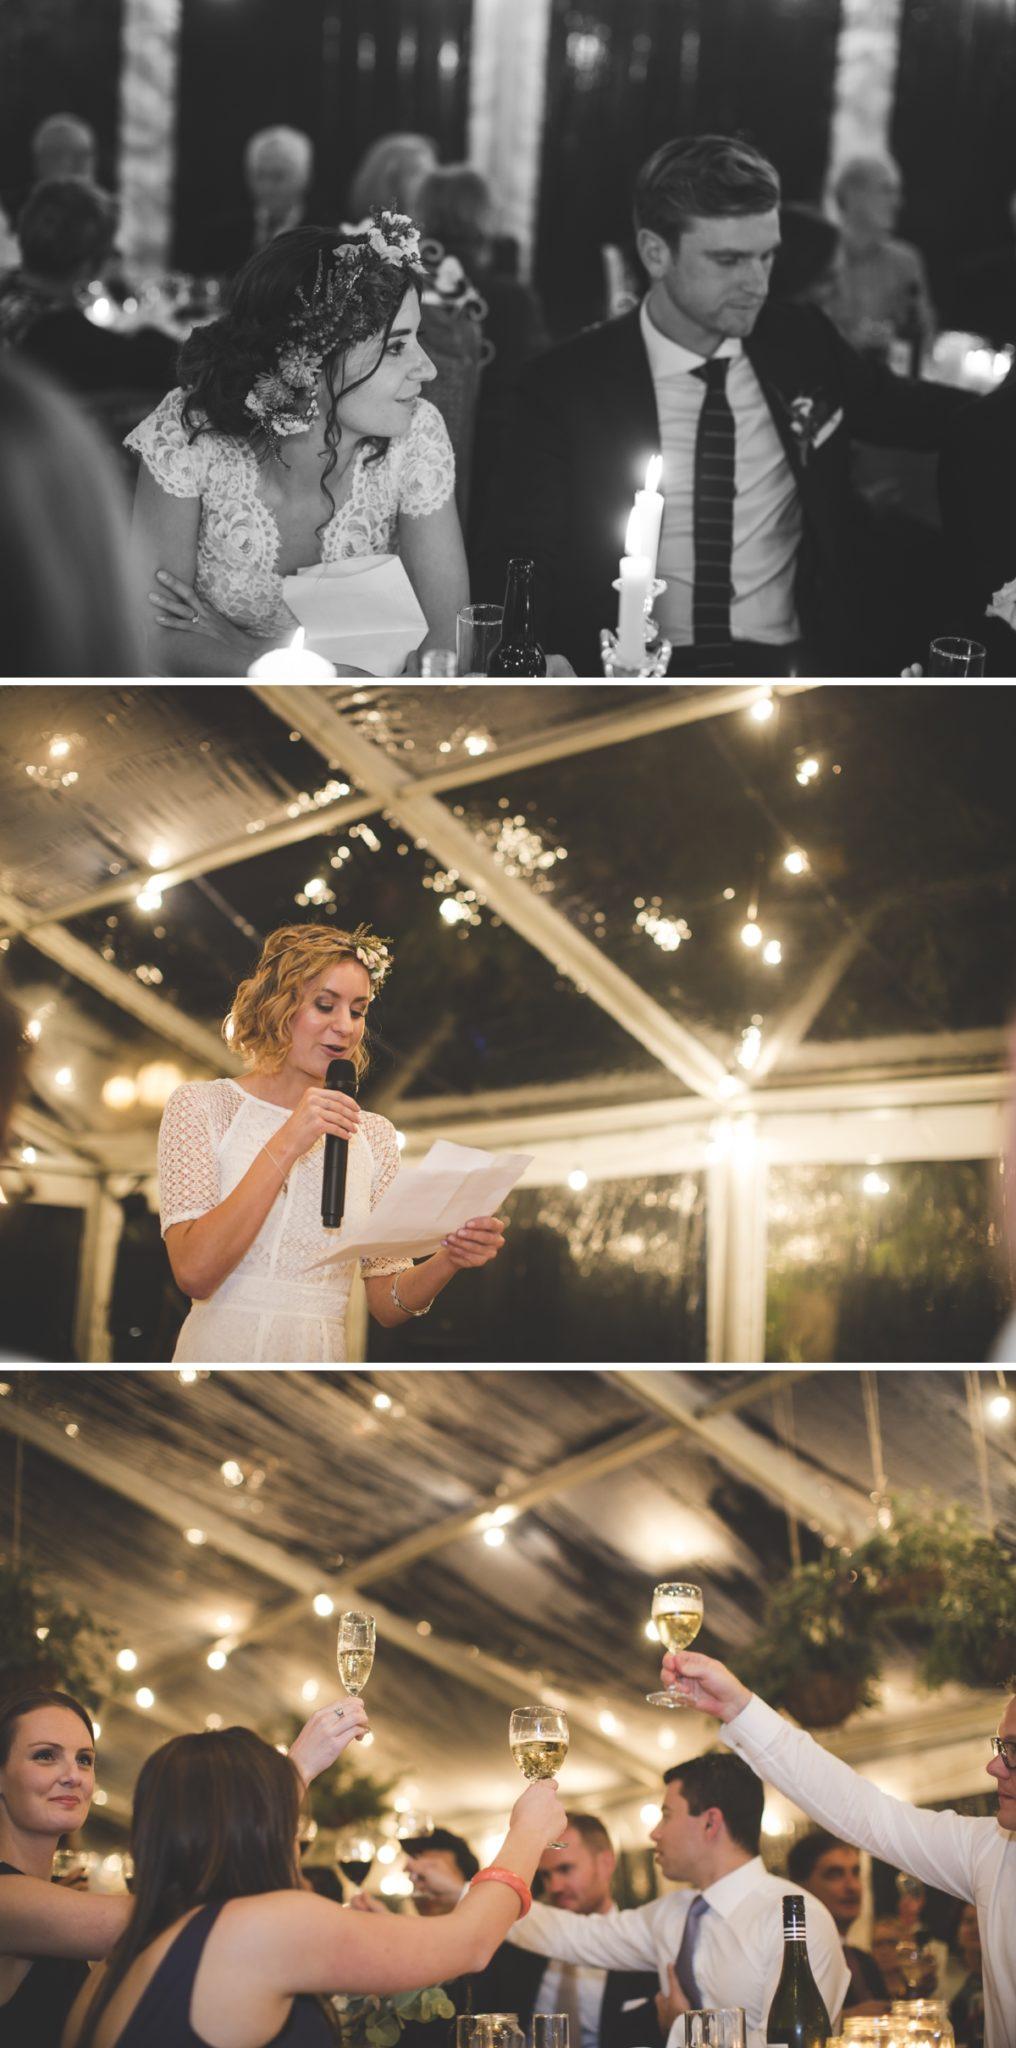 Wagga Wagga Wedding Photographer at Borambola Winery Wagga Wagga Albury wedding photographer Culcairn wedding venue_1092